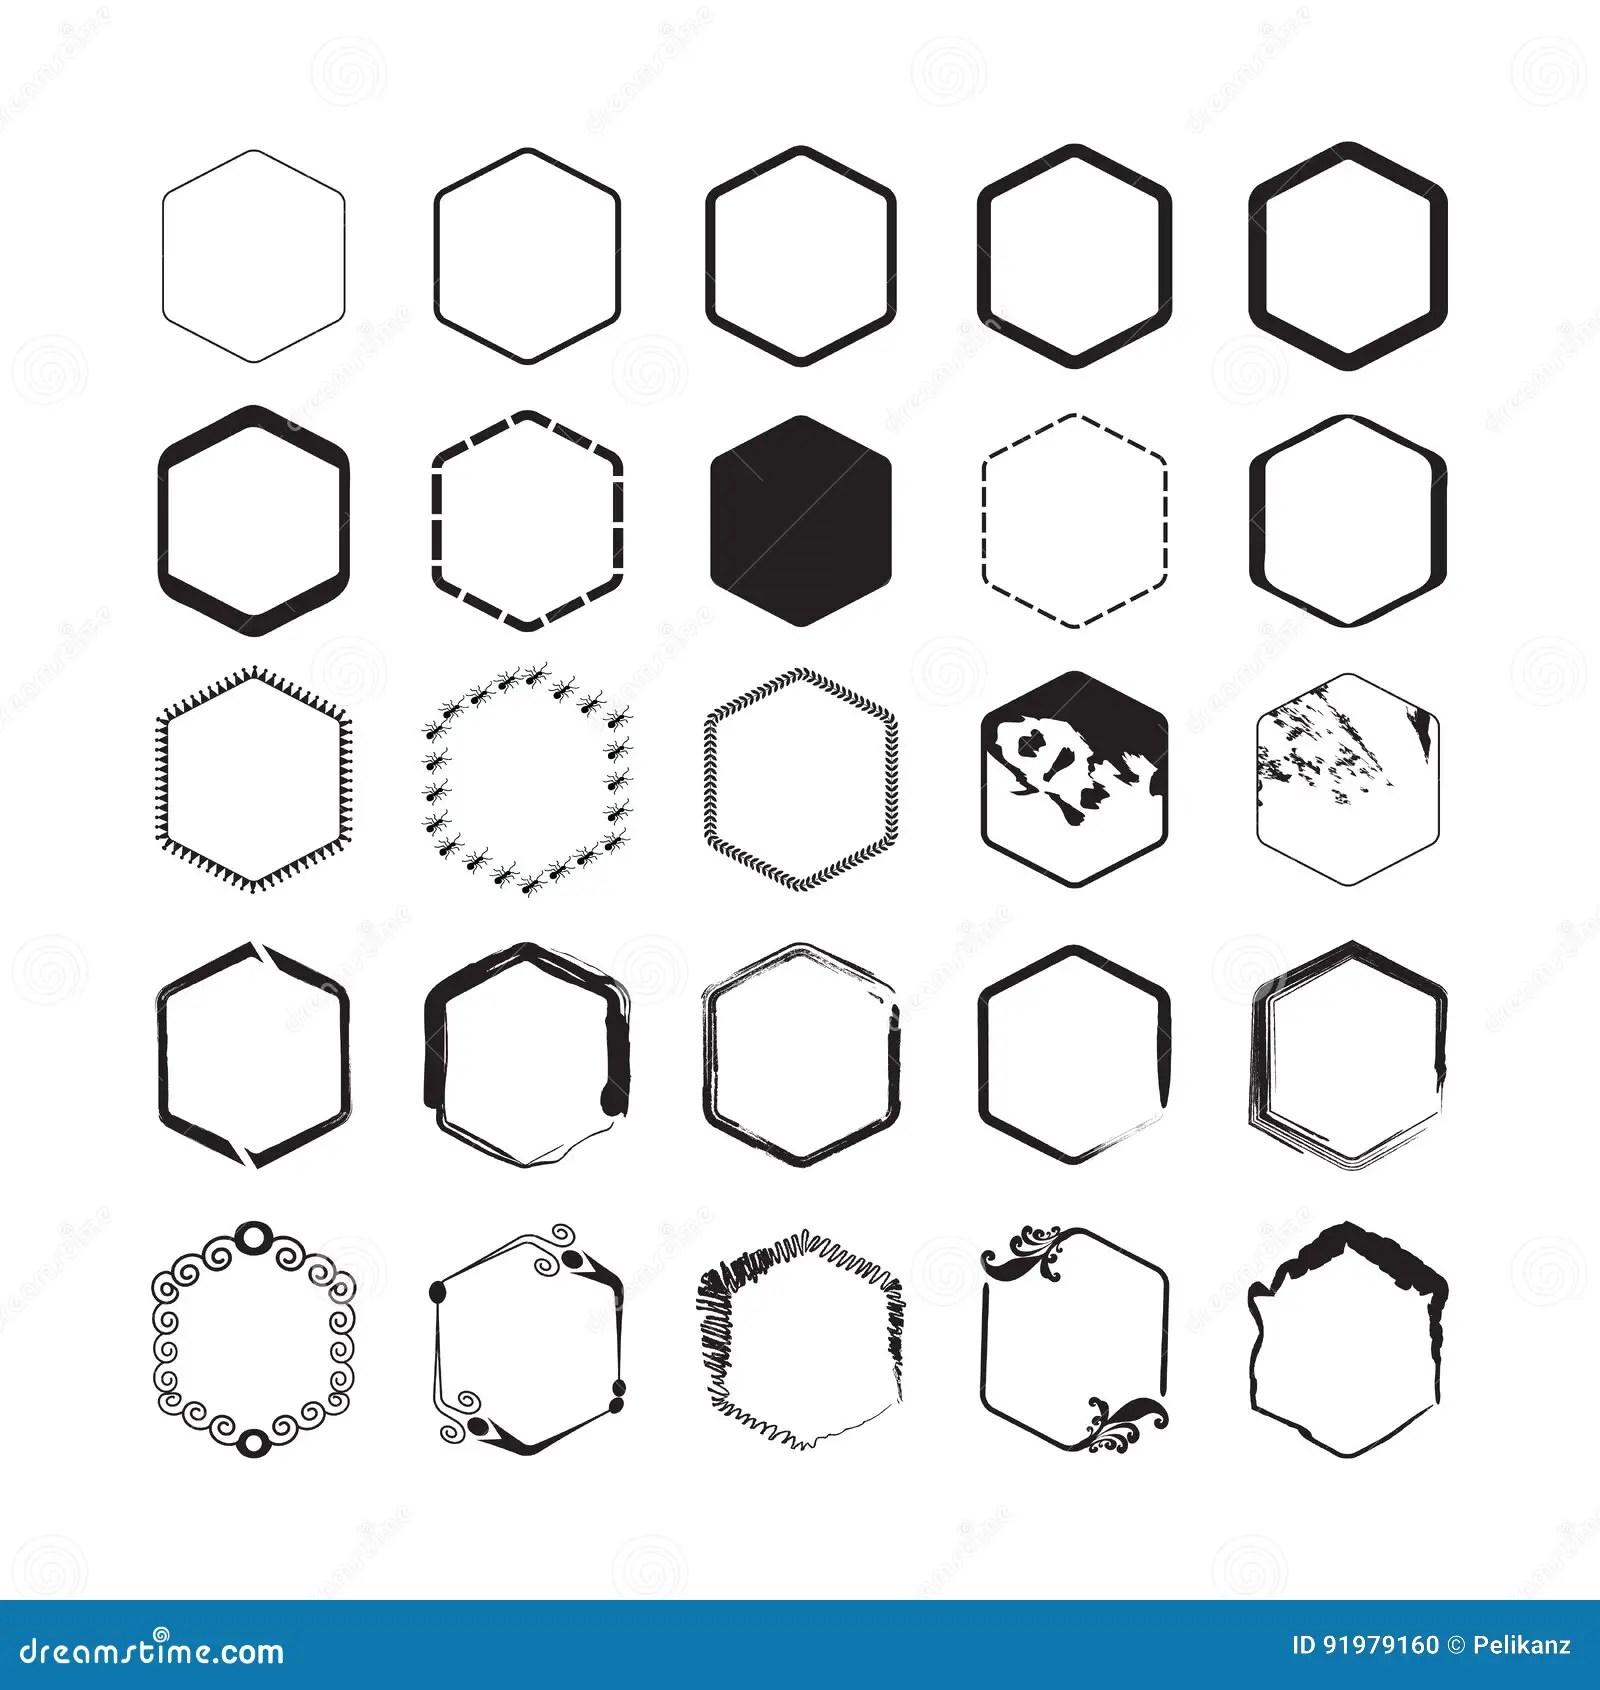 Hexagon Background Black And White Cartoon Vector